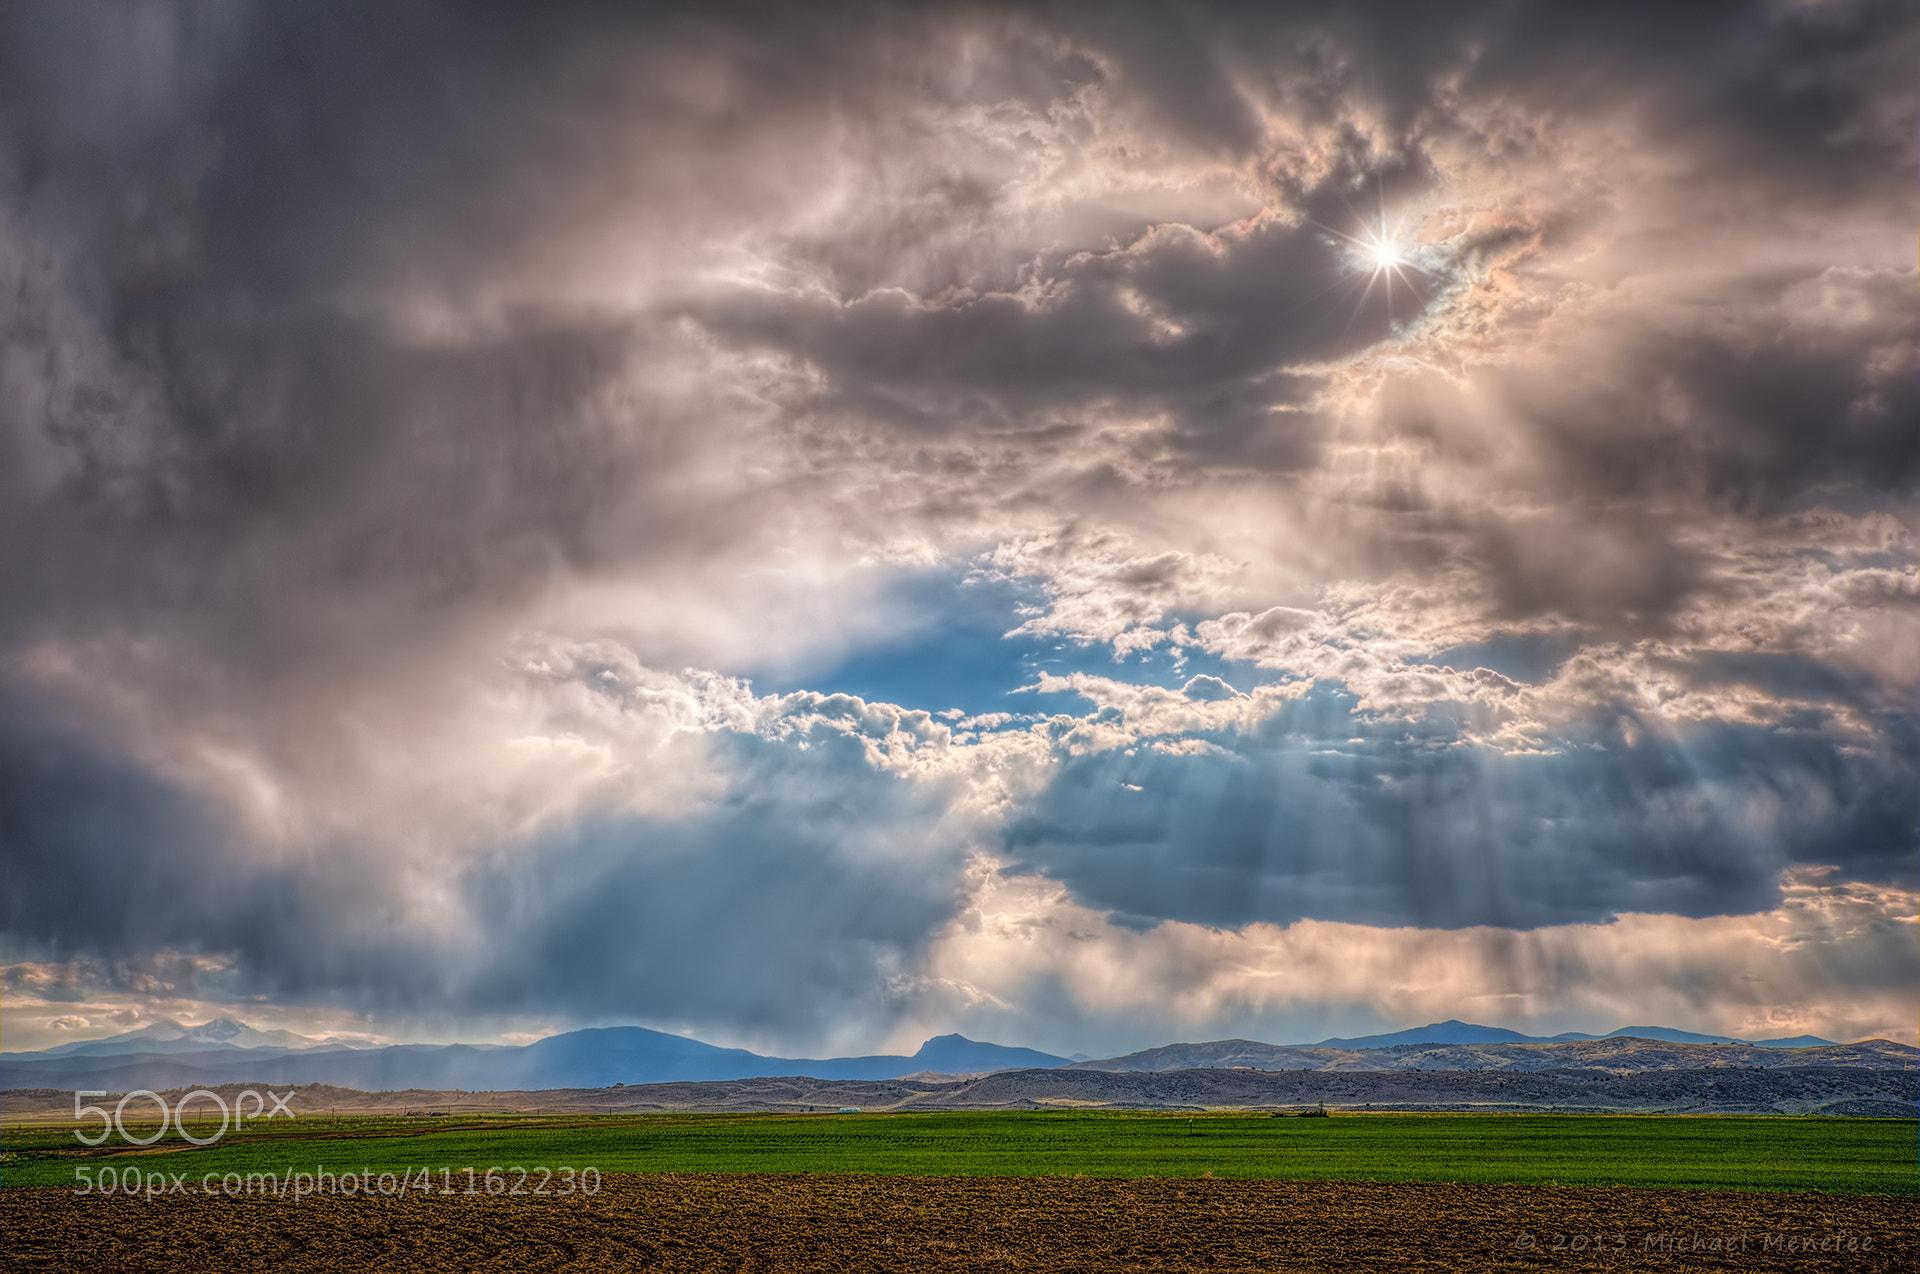 Photograph Long View Farm Ephemera by Michael Menefee on 500px